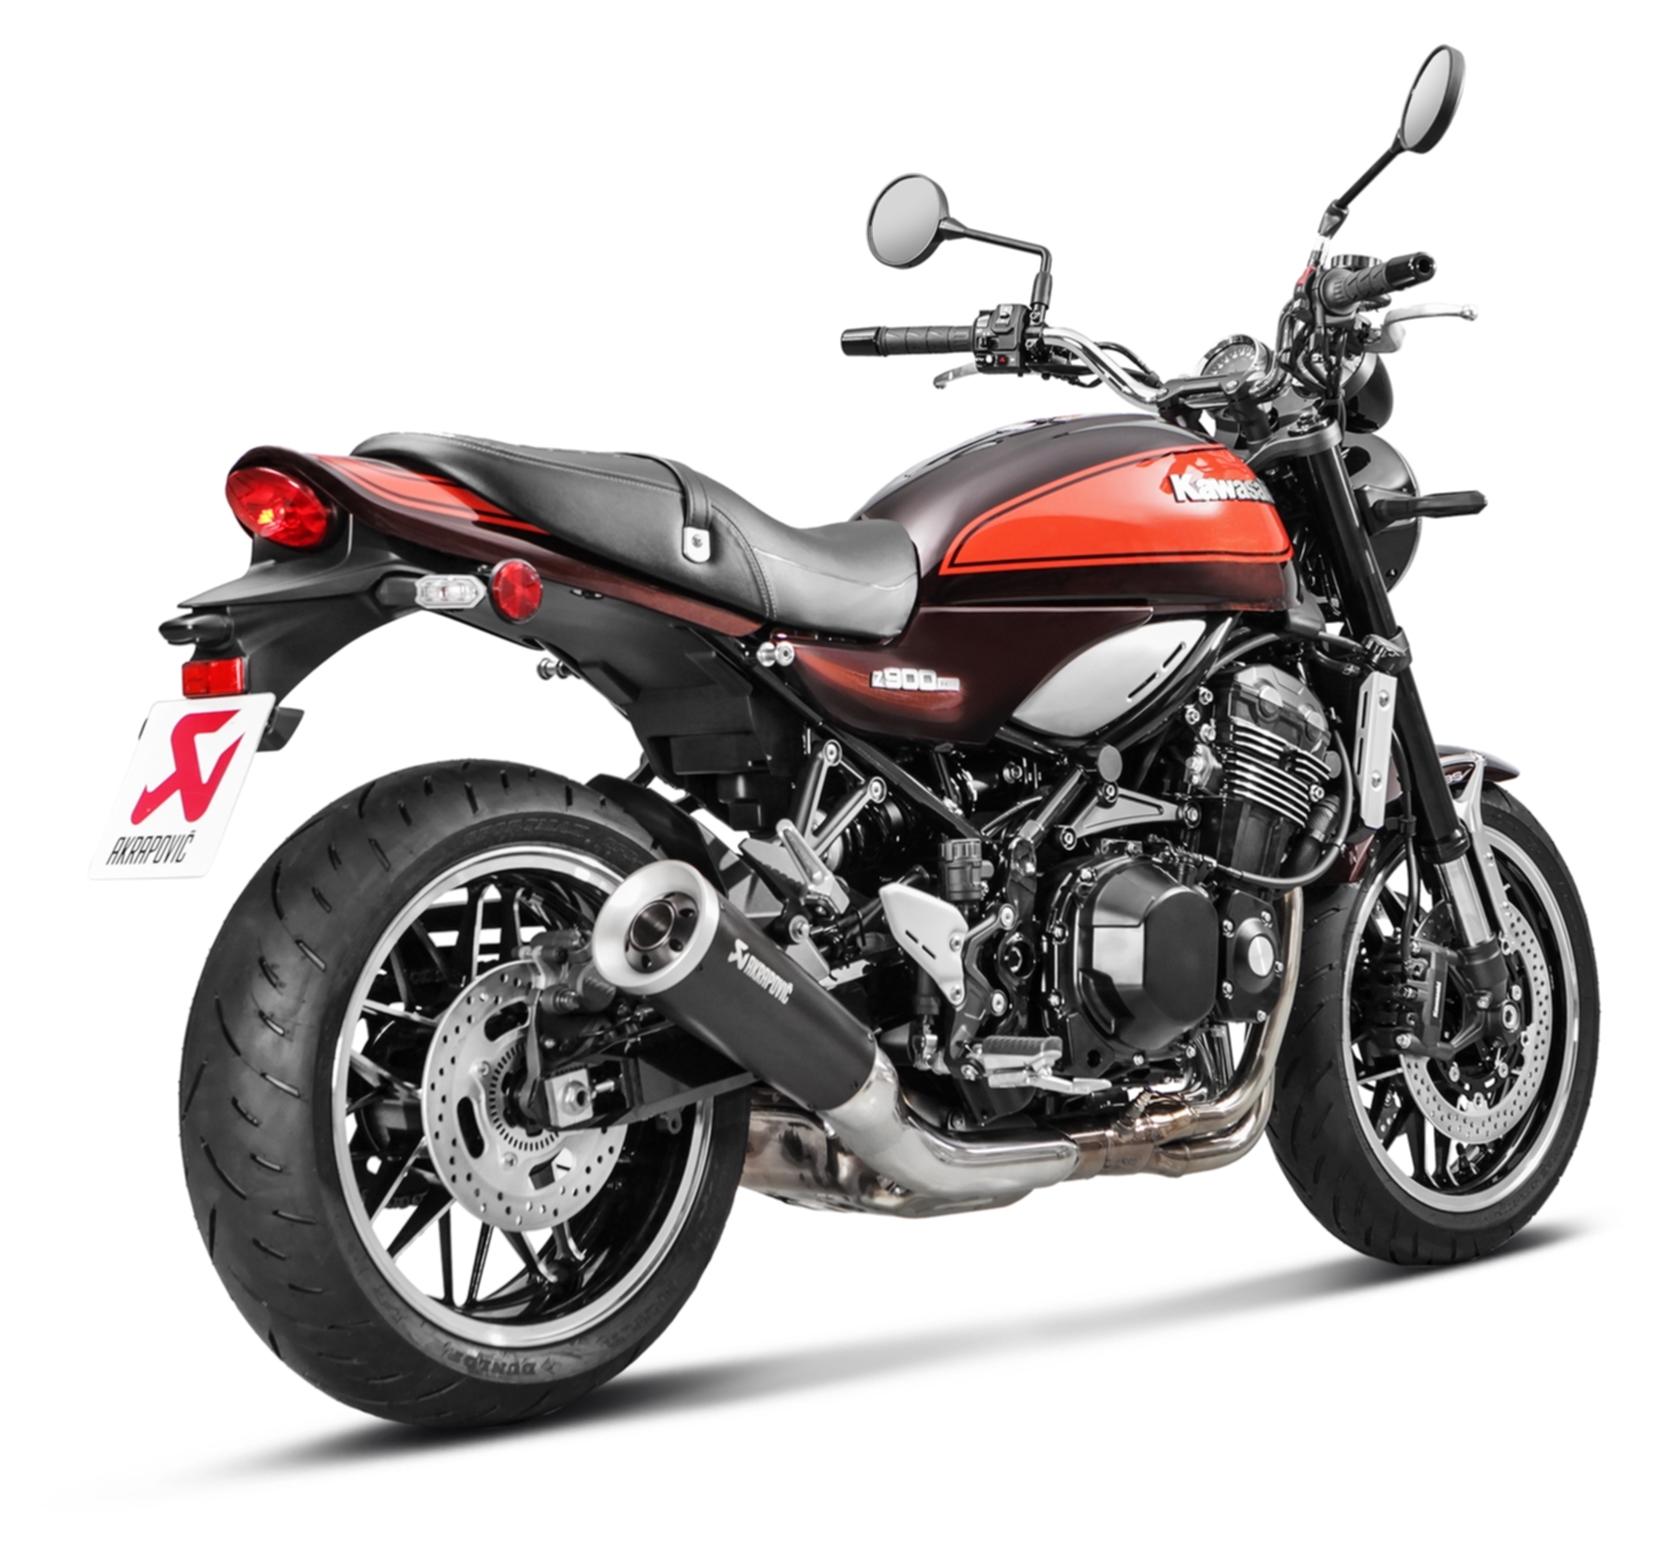 Akrapovic Slip On Exhaust Kawasaki Z900rs Cafe 2018 2019 10 82 20 Off Revzilla